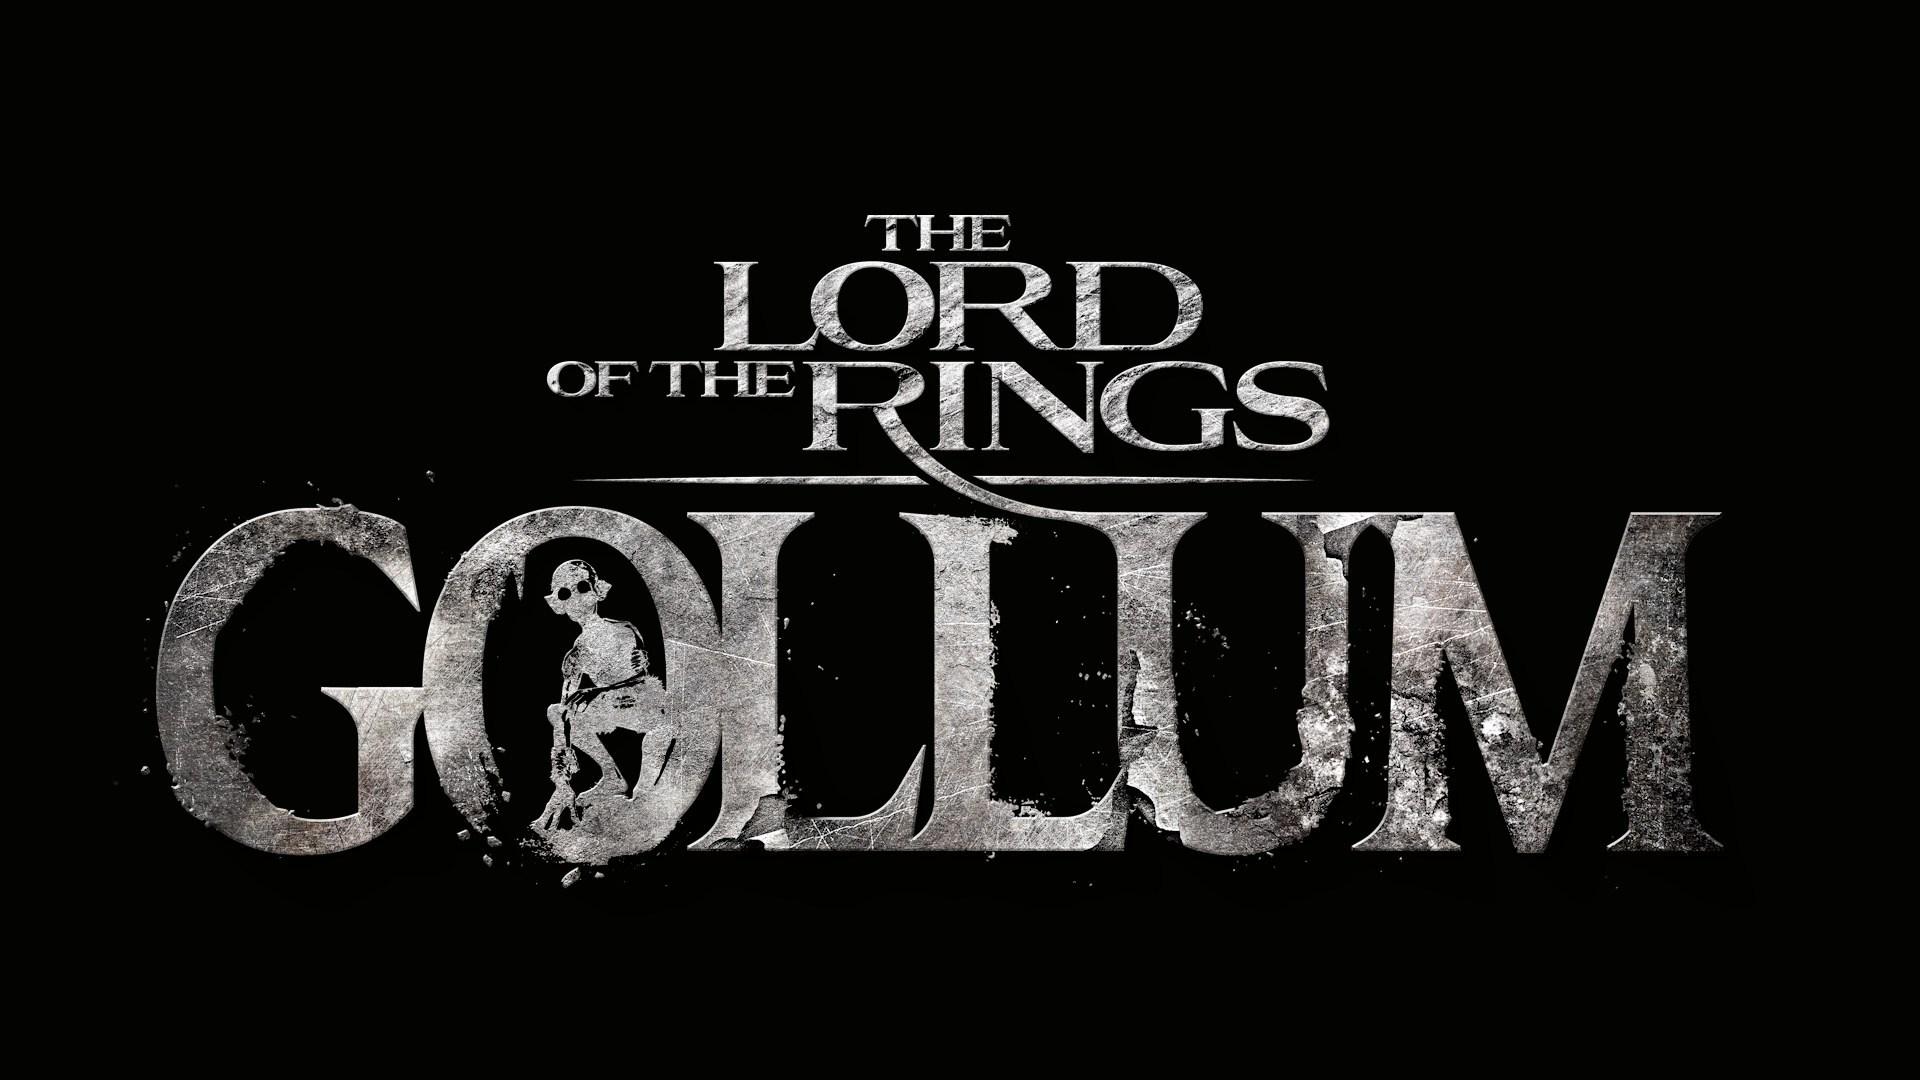 lord of the rings gollum logo wallpaper 73206